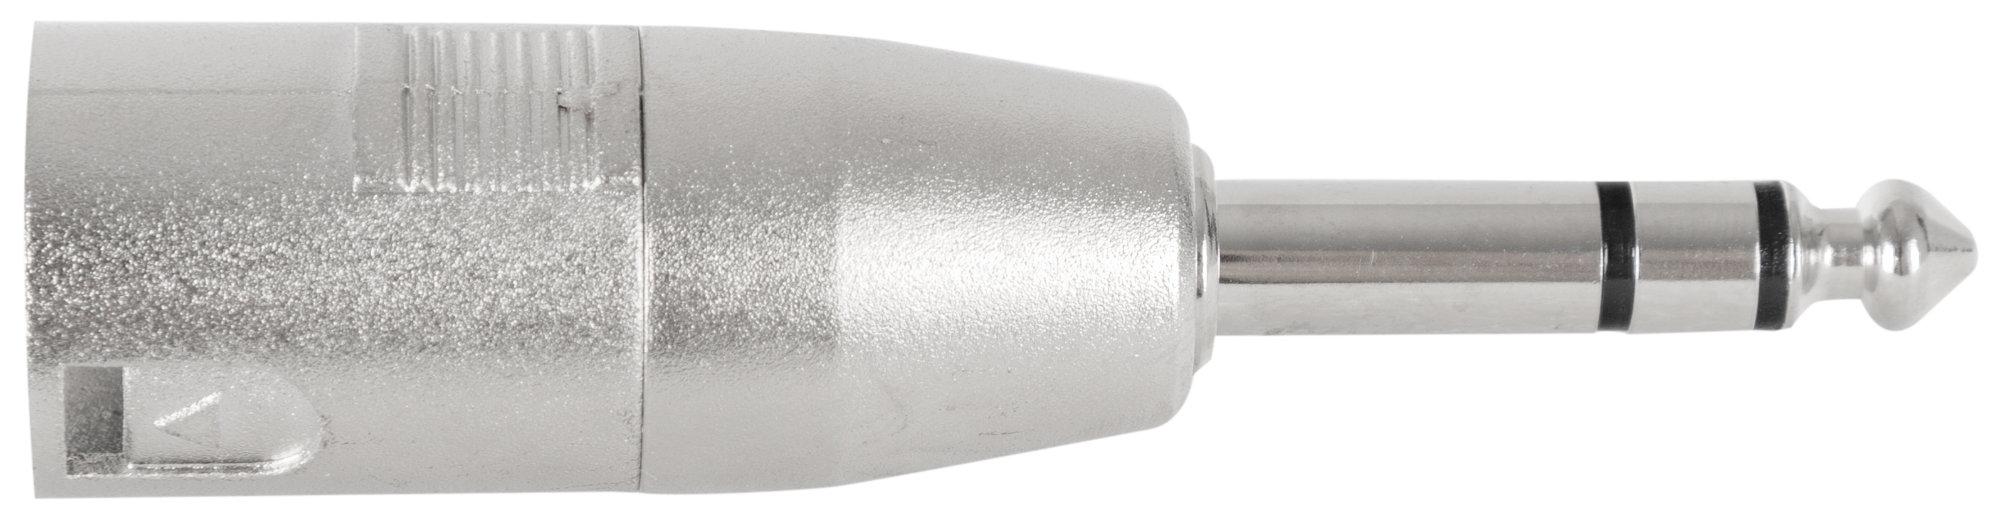 Kabelmulticores - Pronomic AD JSXM Adapter 6,3mm Stereo Klinke male | XLR male - Onlineshop Musikhaus Kirstein